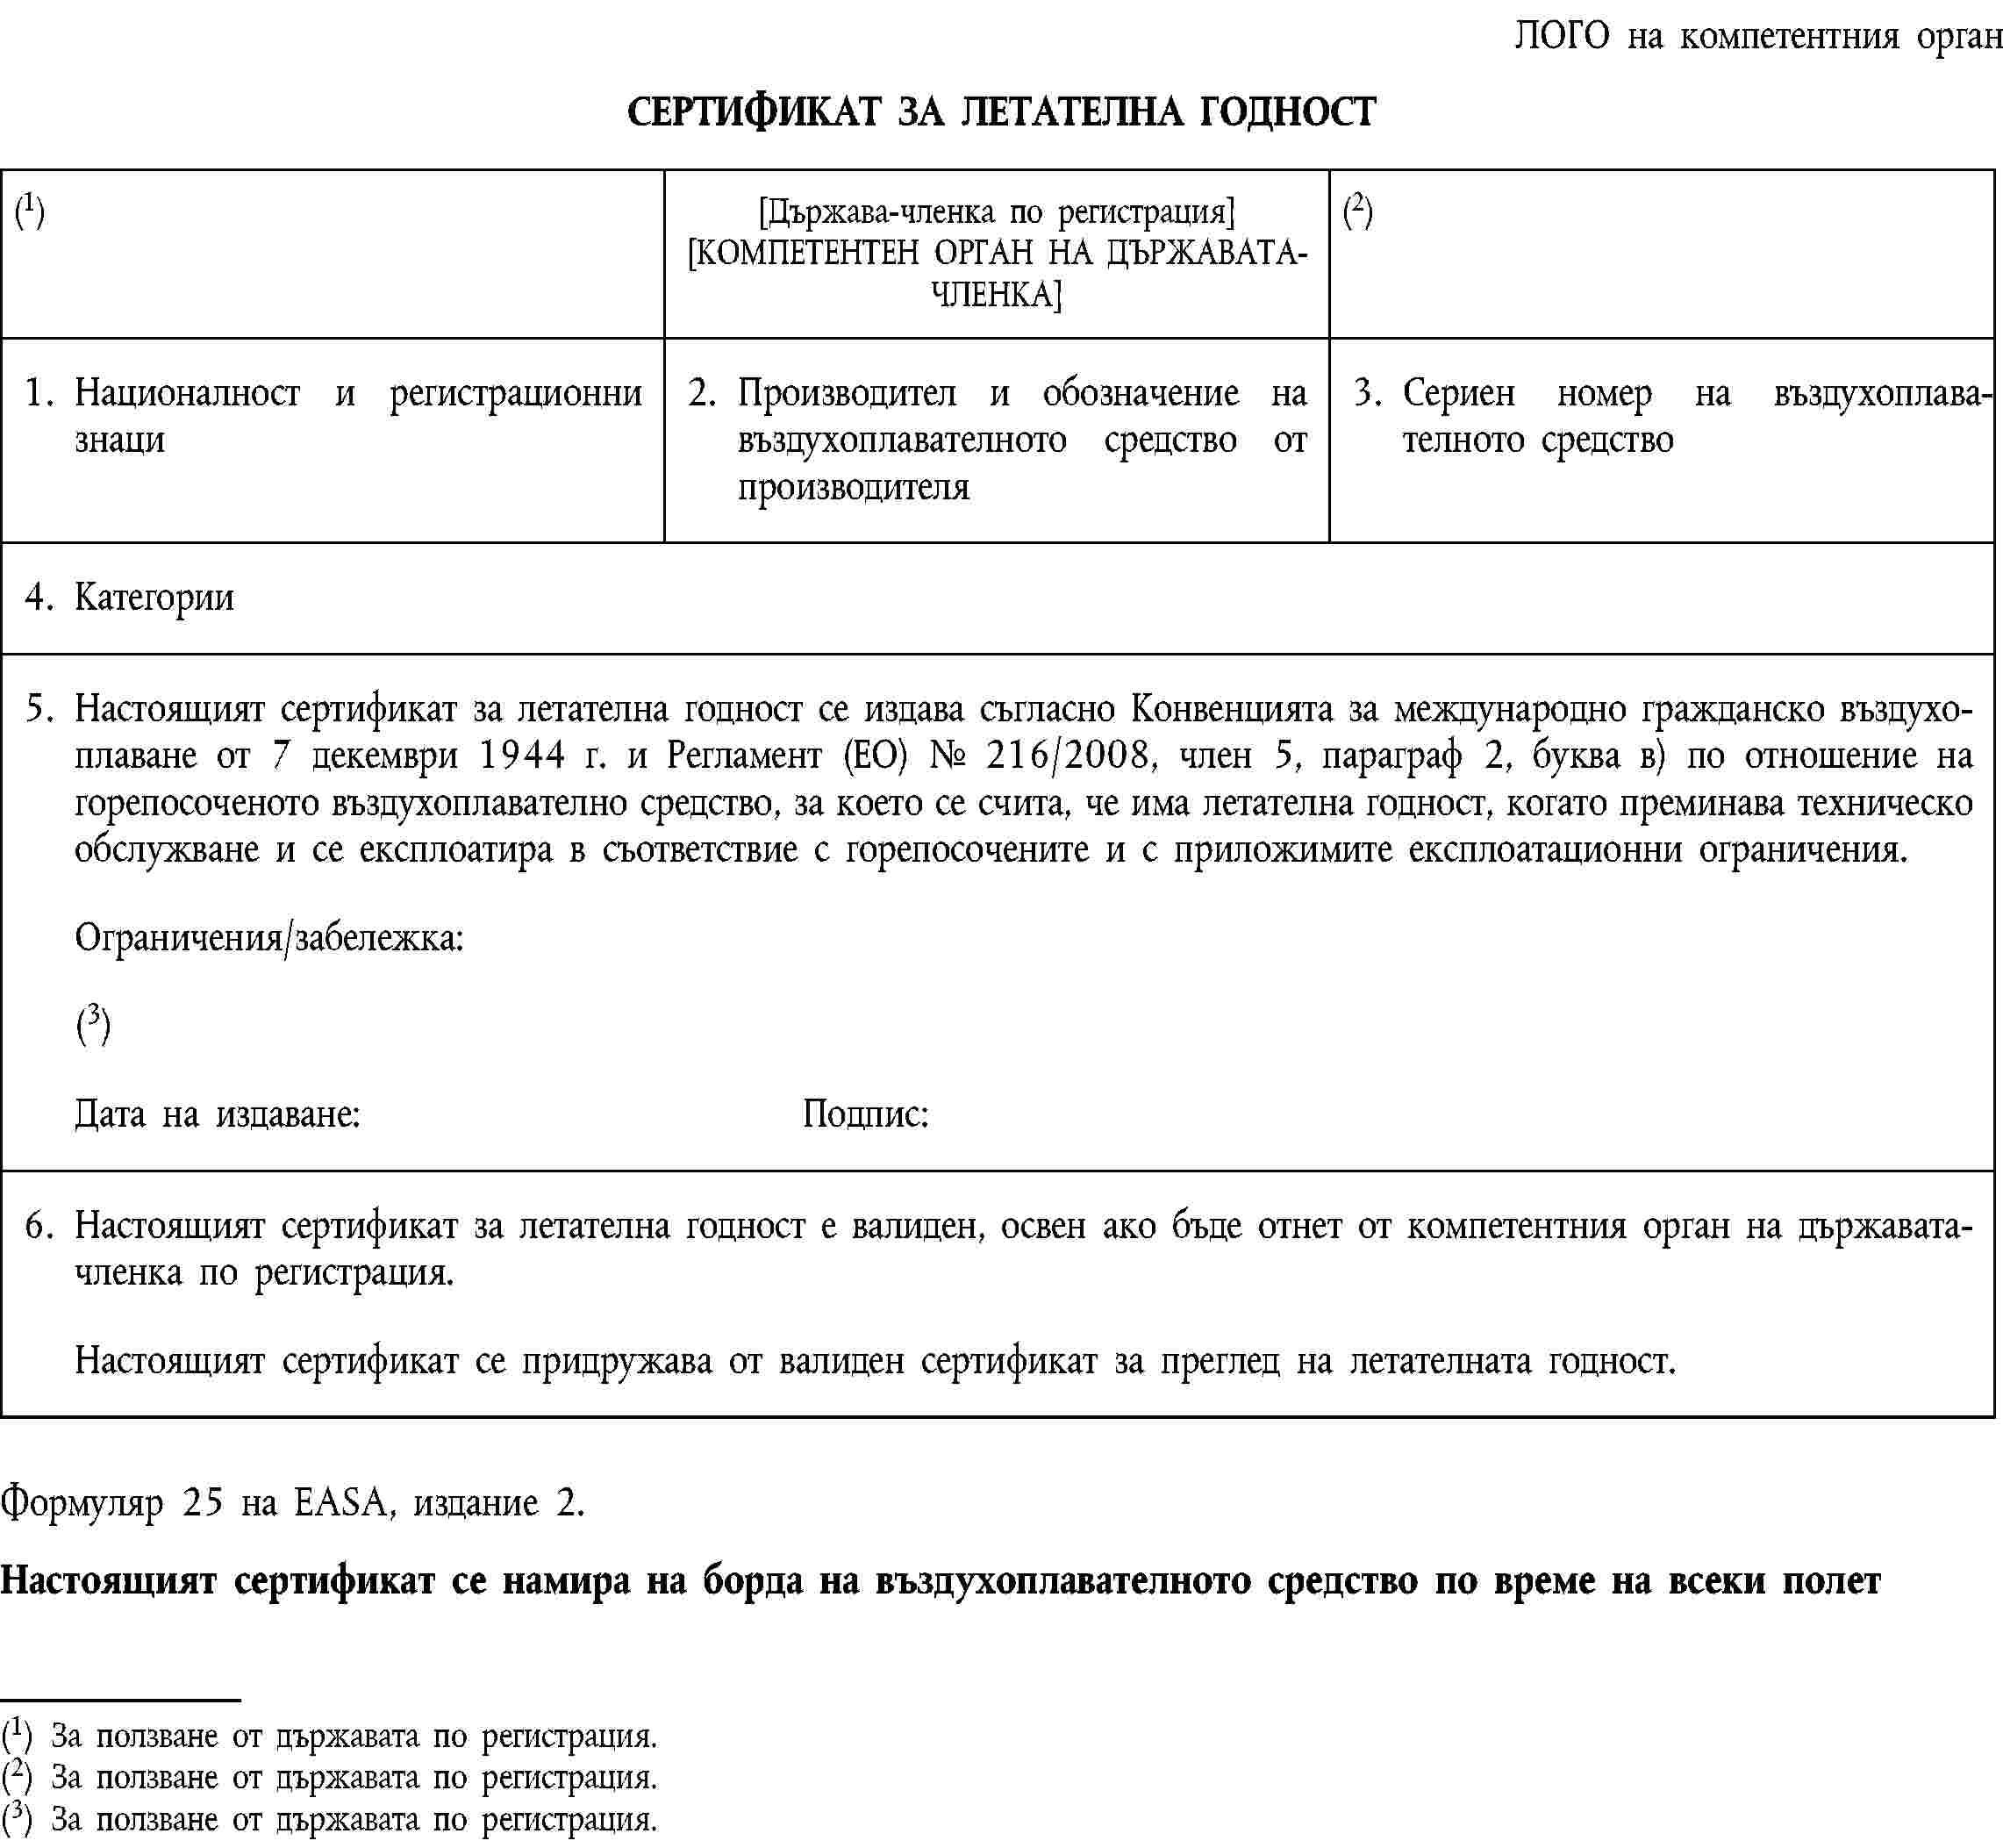 Epa Refrigerant Certification Requirements